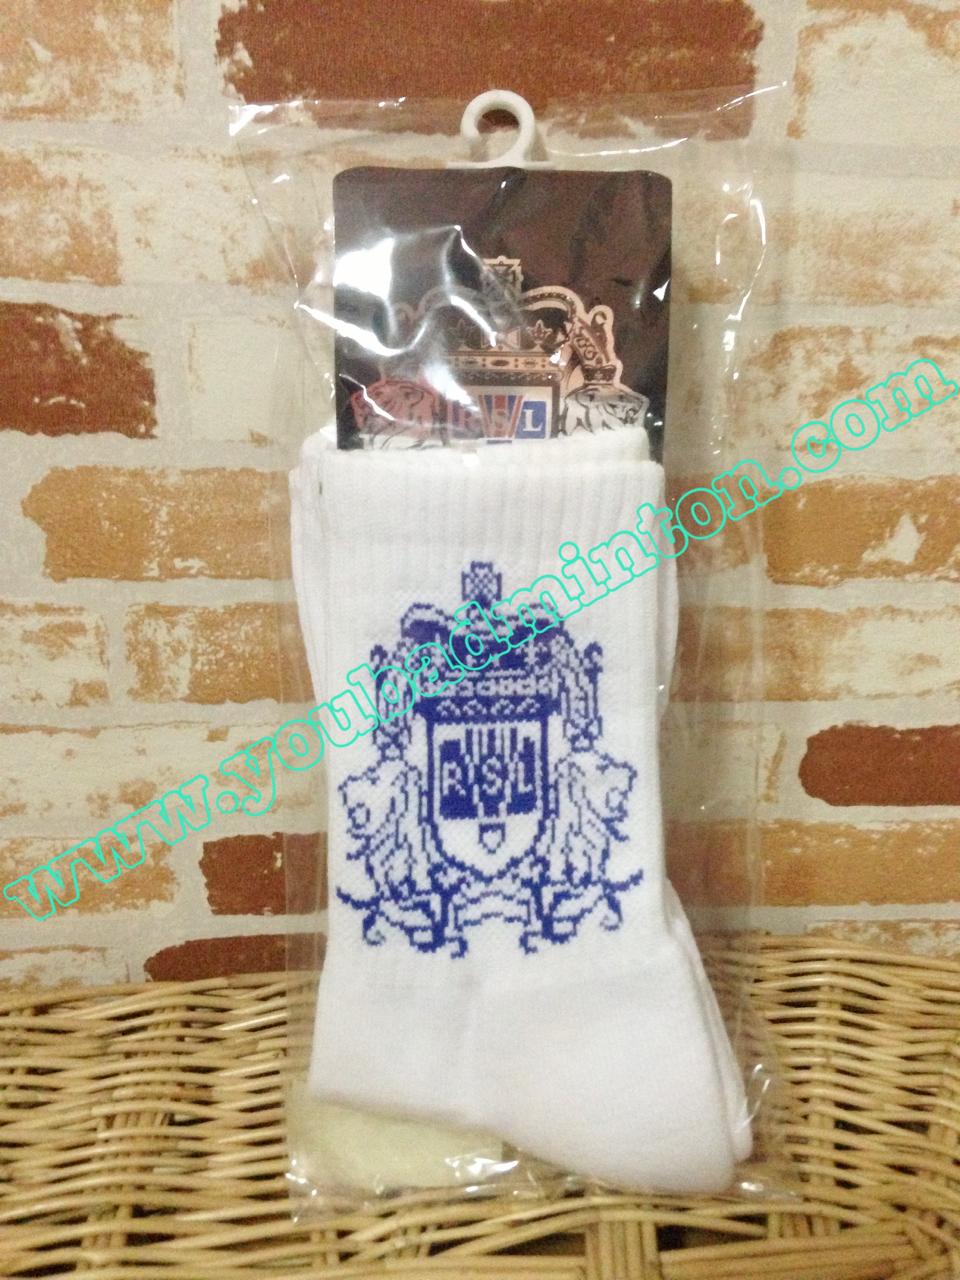 (Code 02) ถุงเท้า RSL สีขาวลายน้ำเงิน เนื้อหนาอย่างดีนุ่มใส่กระชับสบายเท้ามากๆๆ